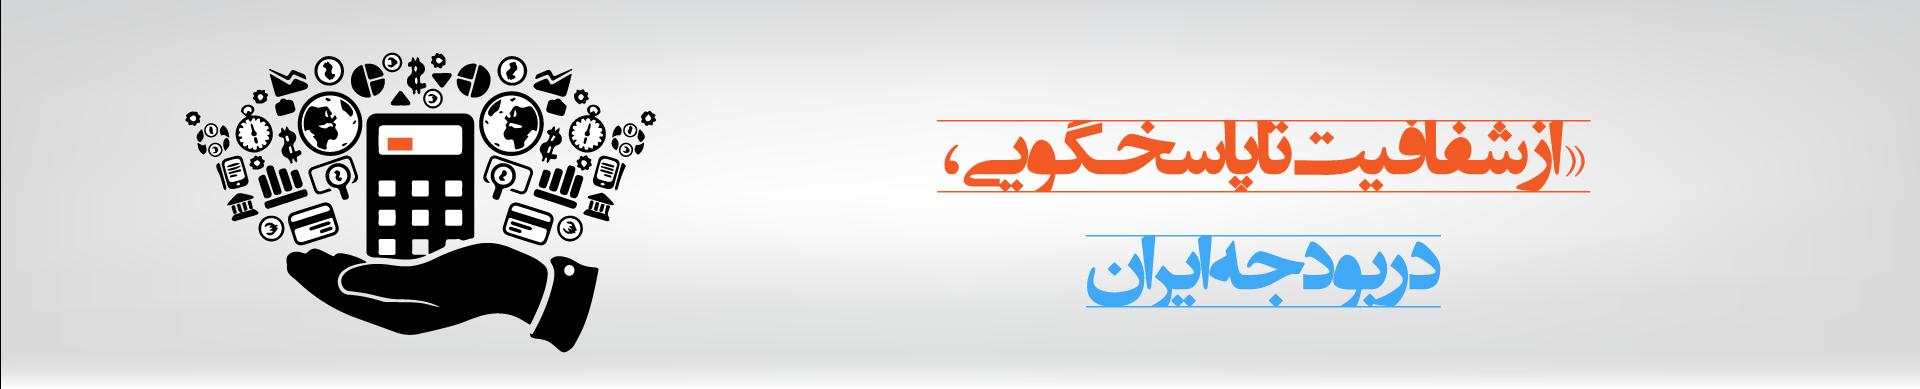 bodje-yab-banner